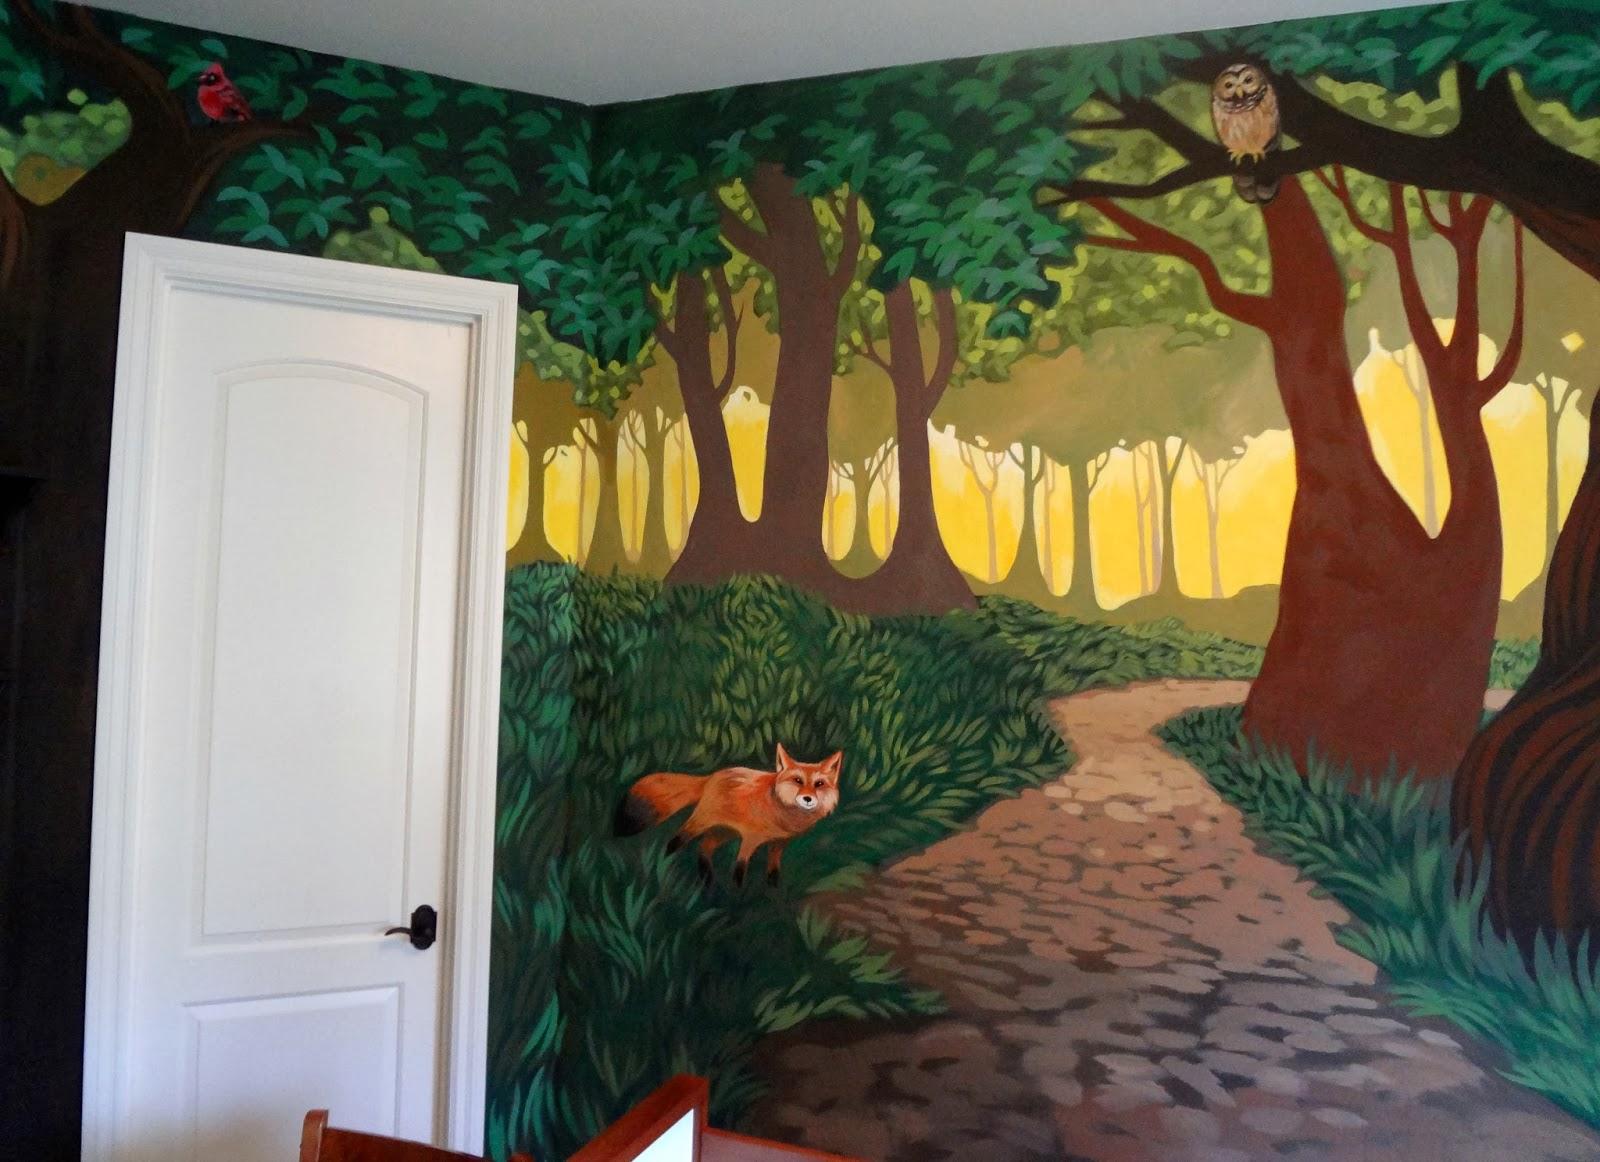 The Talking Walls: Fantastical Forest Nursery Mural... D.O